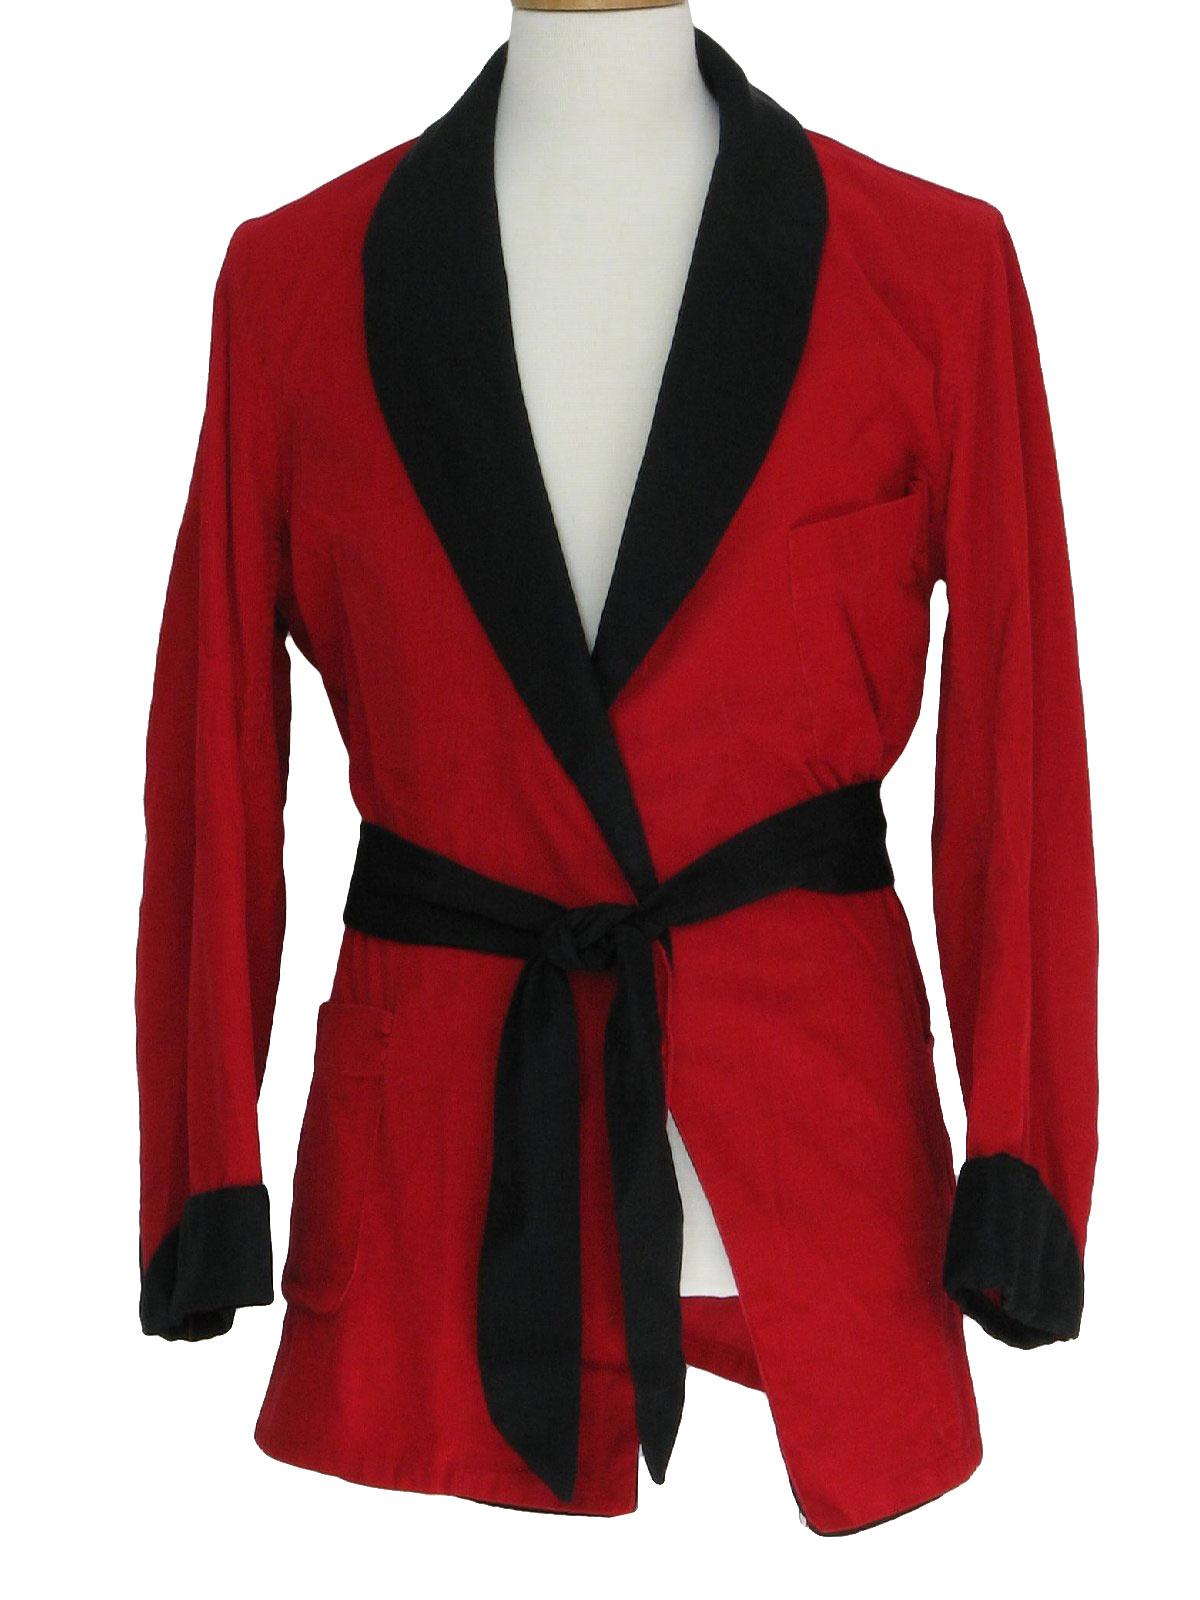 Vintage 1950s Red and Black Corduroy Smoking Jacket x47b5E